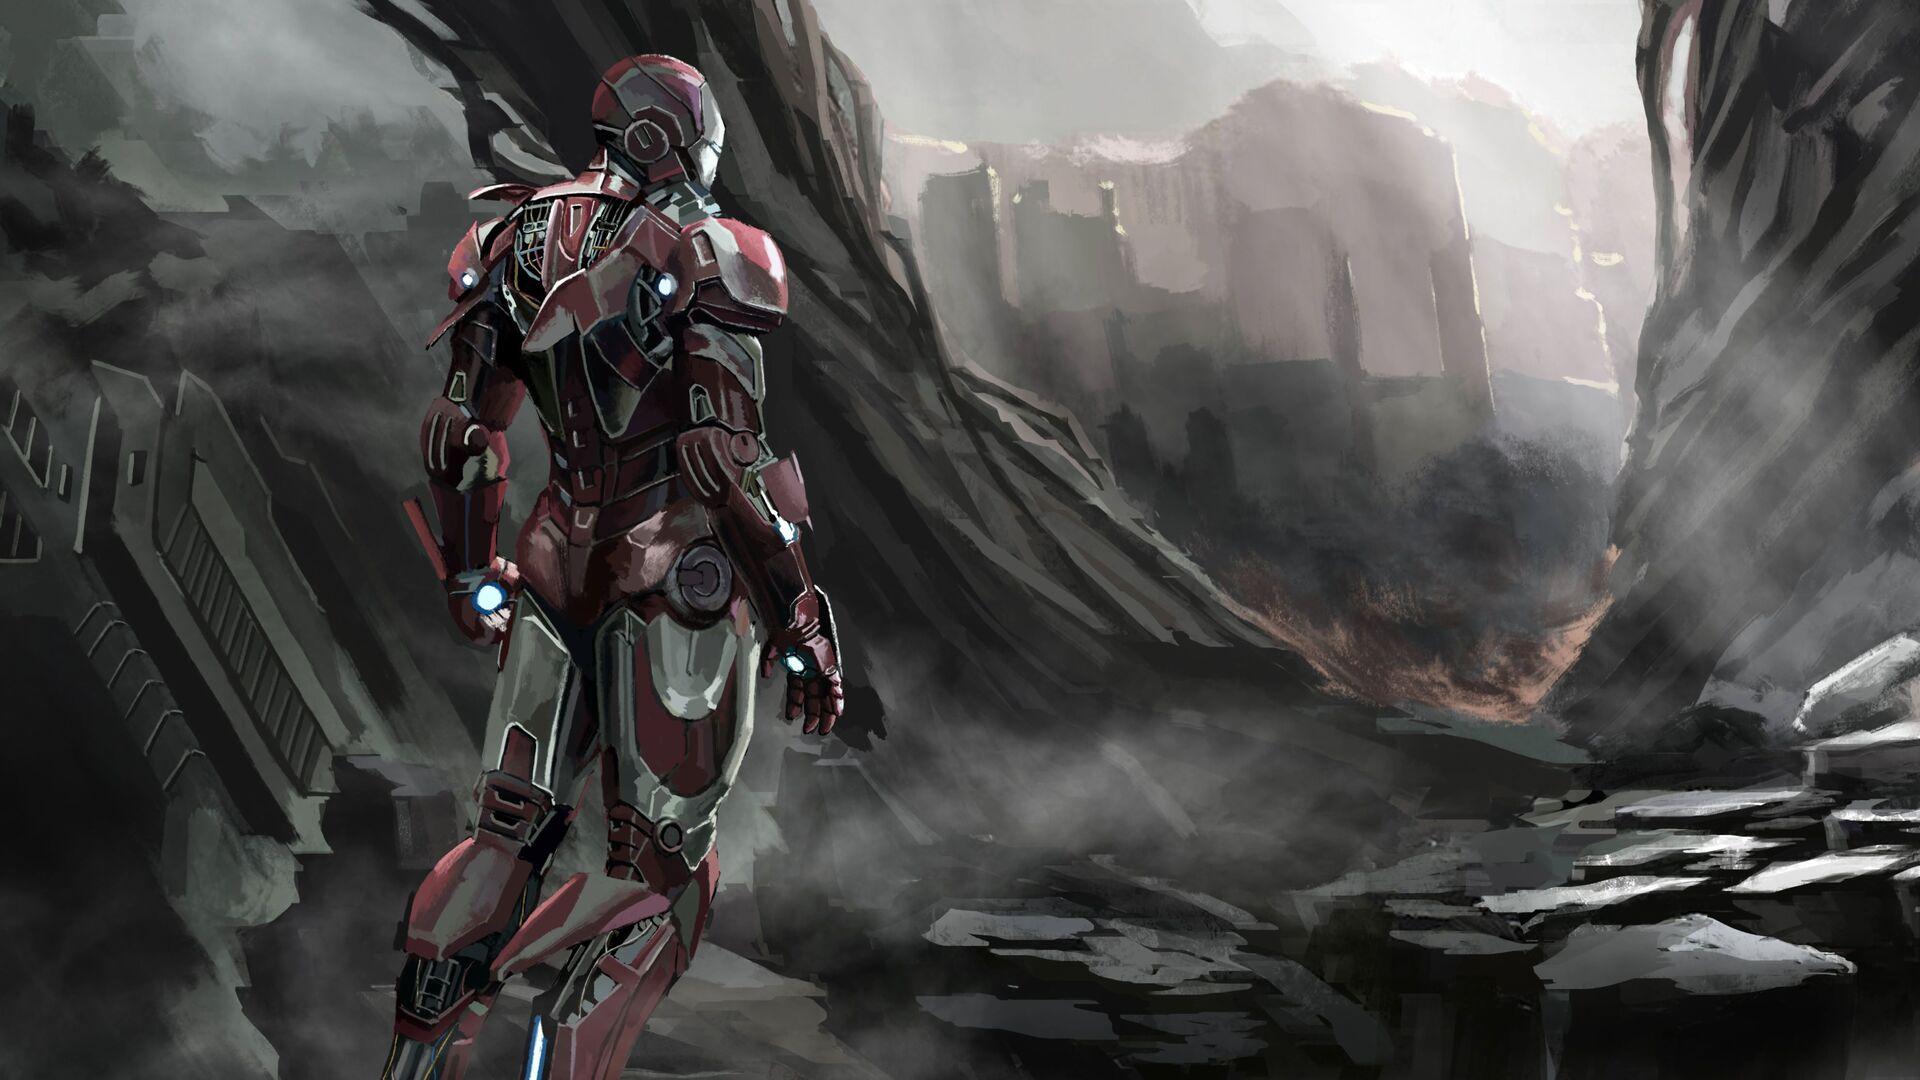 1920x1080 Iron Man New Art 2019 Laptop Full Hd 1080p Hd 4k